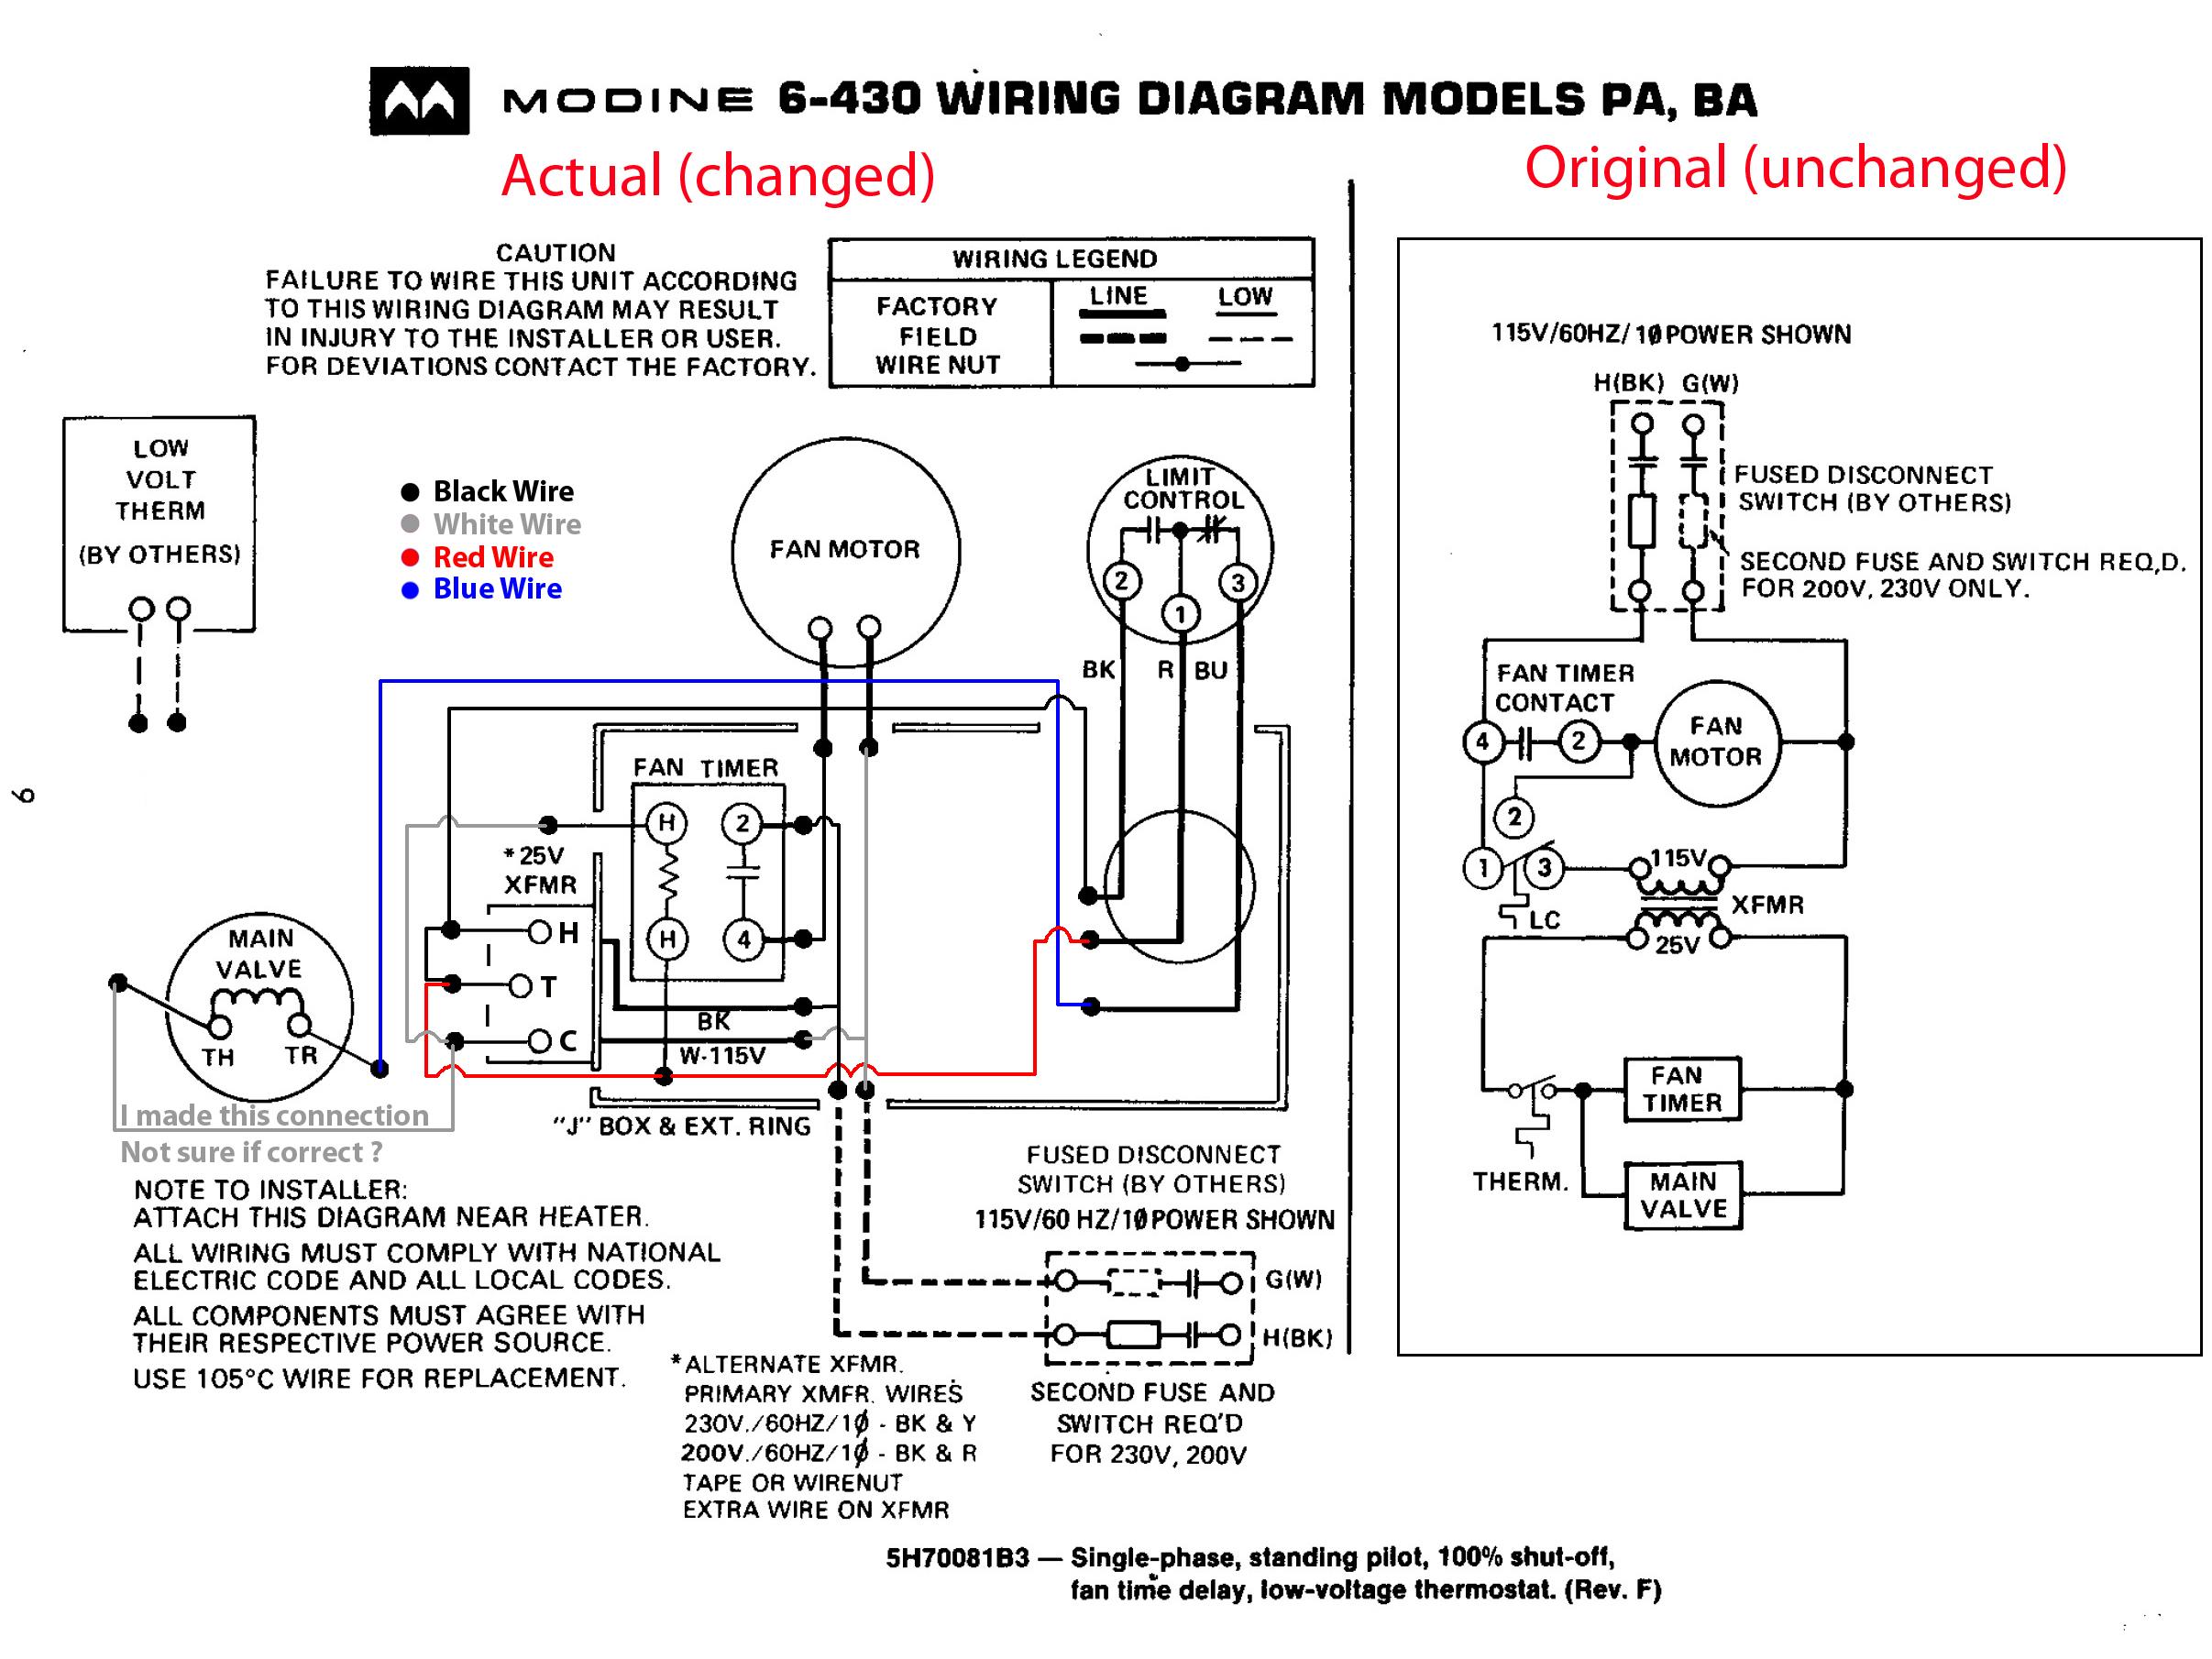 Modine Gas Heater Wiring Diagram - Explore Wiring Diagram On The Net on sears wiring diagram, atlas wiring diagram, ingersoll rand wiring diagram, abb wiring diagram, bell & gossett wiring diagram, viking wiring diagram, weil-mclain wiring diagram, broan wiring diagram, little giant wiring diagram, cooper wiring diagram, a.o. smith wiring diagram, panasonic wiring diagram, crosley wiring diagram, dorman wiring diagram, hobart wiring diagram, lochinvar wiring diagram, rockwell wiring diagram, johnson controls wiring diagram, payne wiring diagram, general wiring diagram,